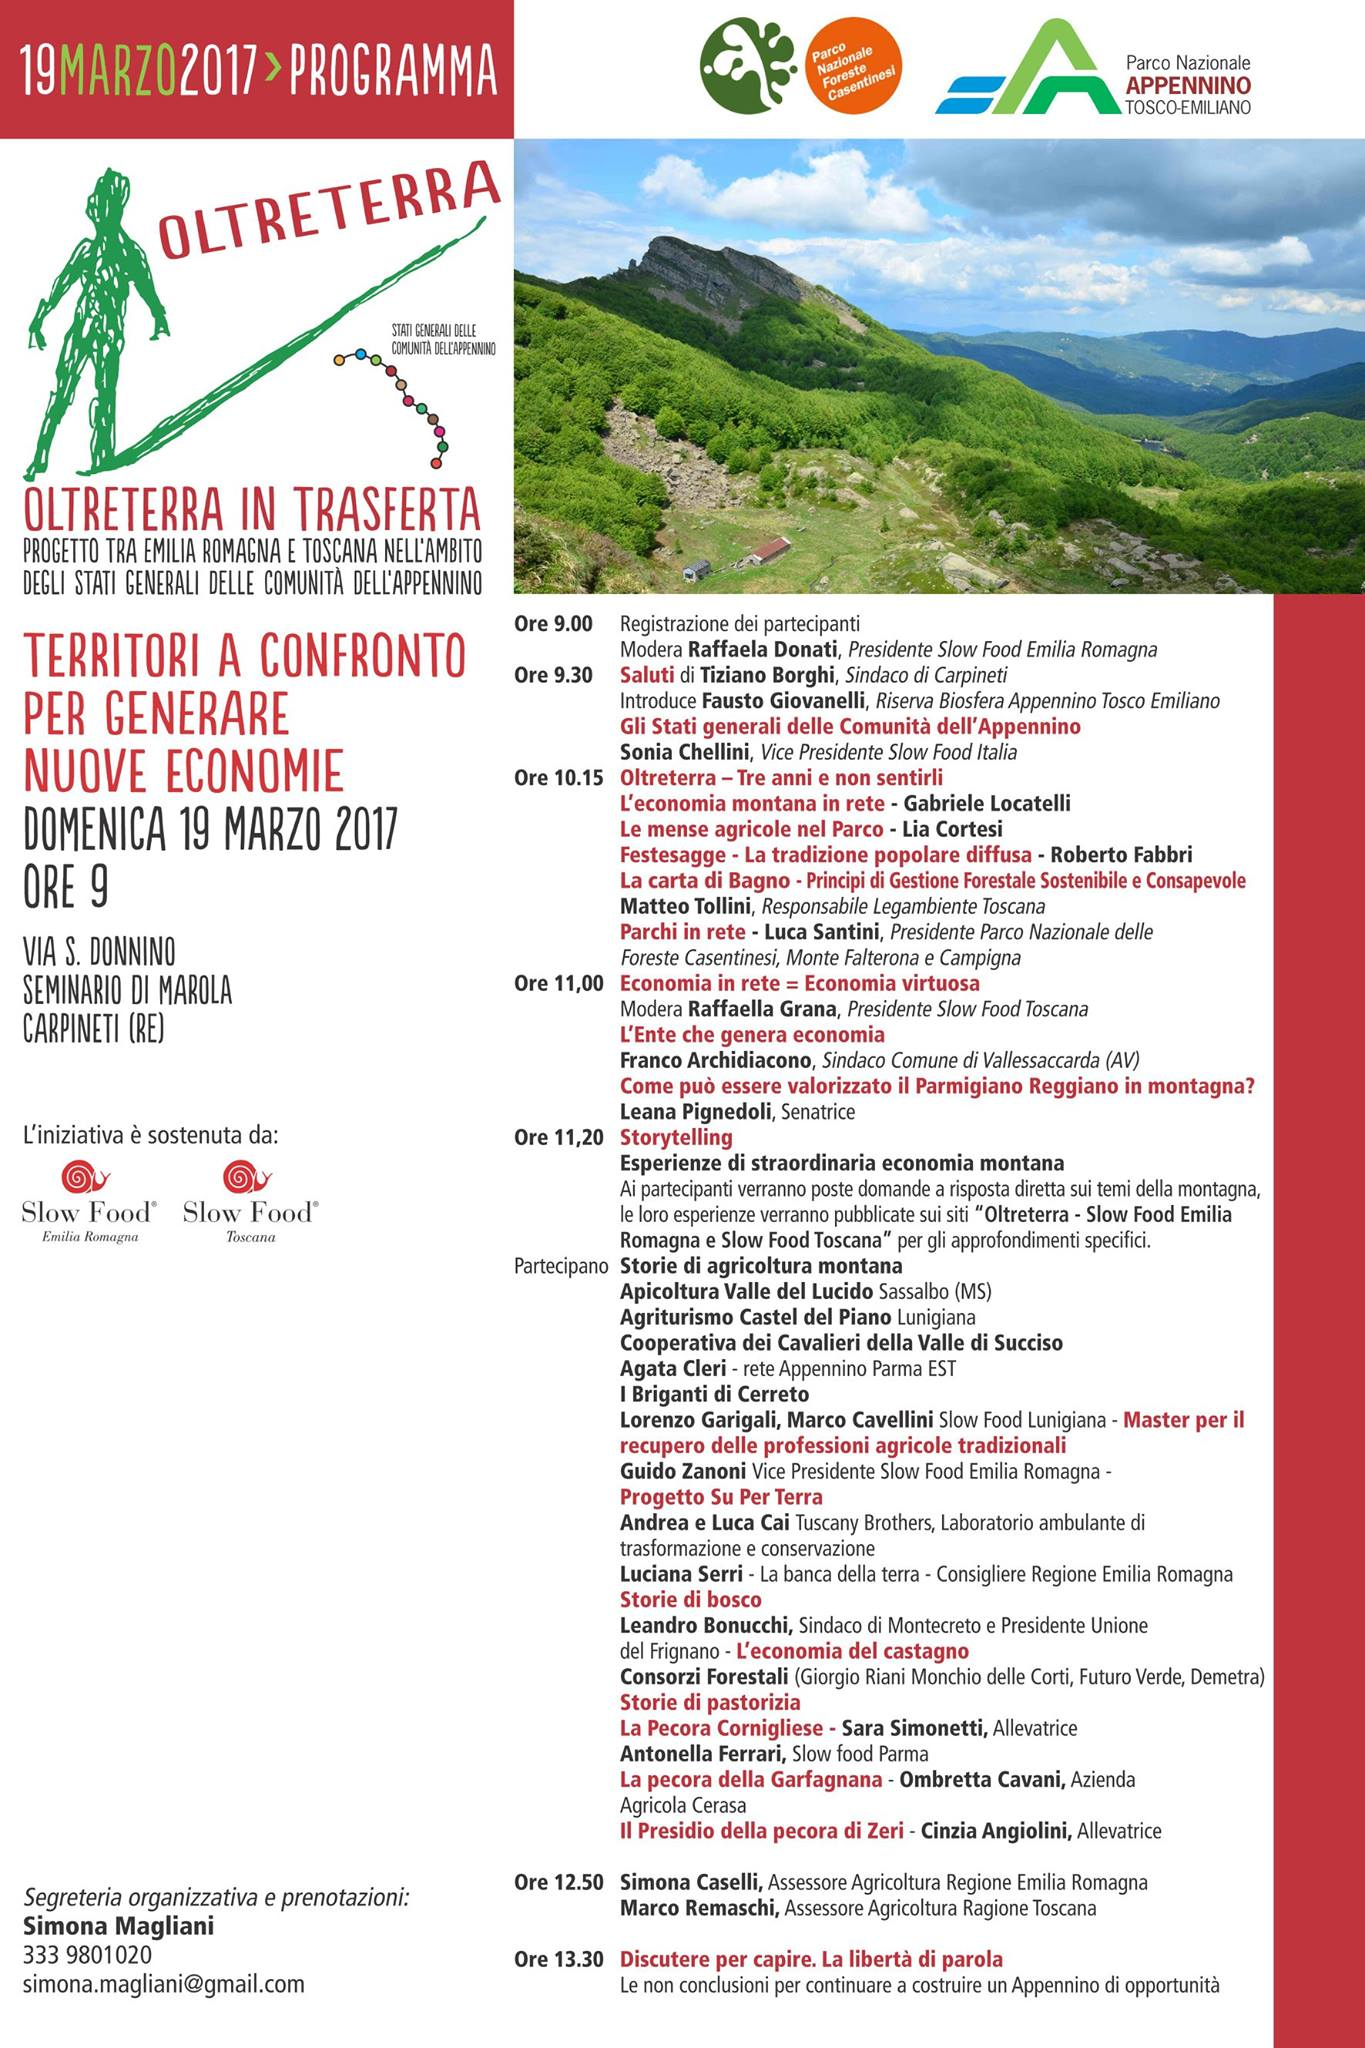 Slow Food Forlì : Oltreterra in trasferta